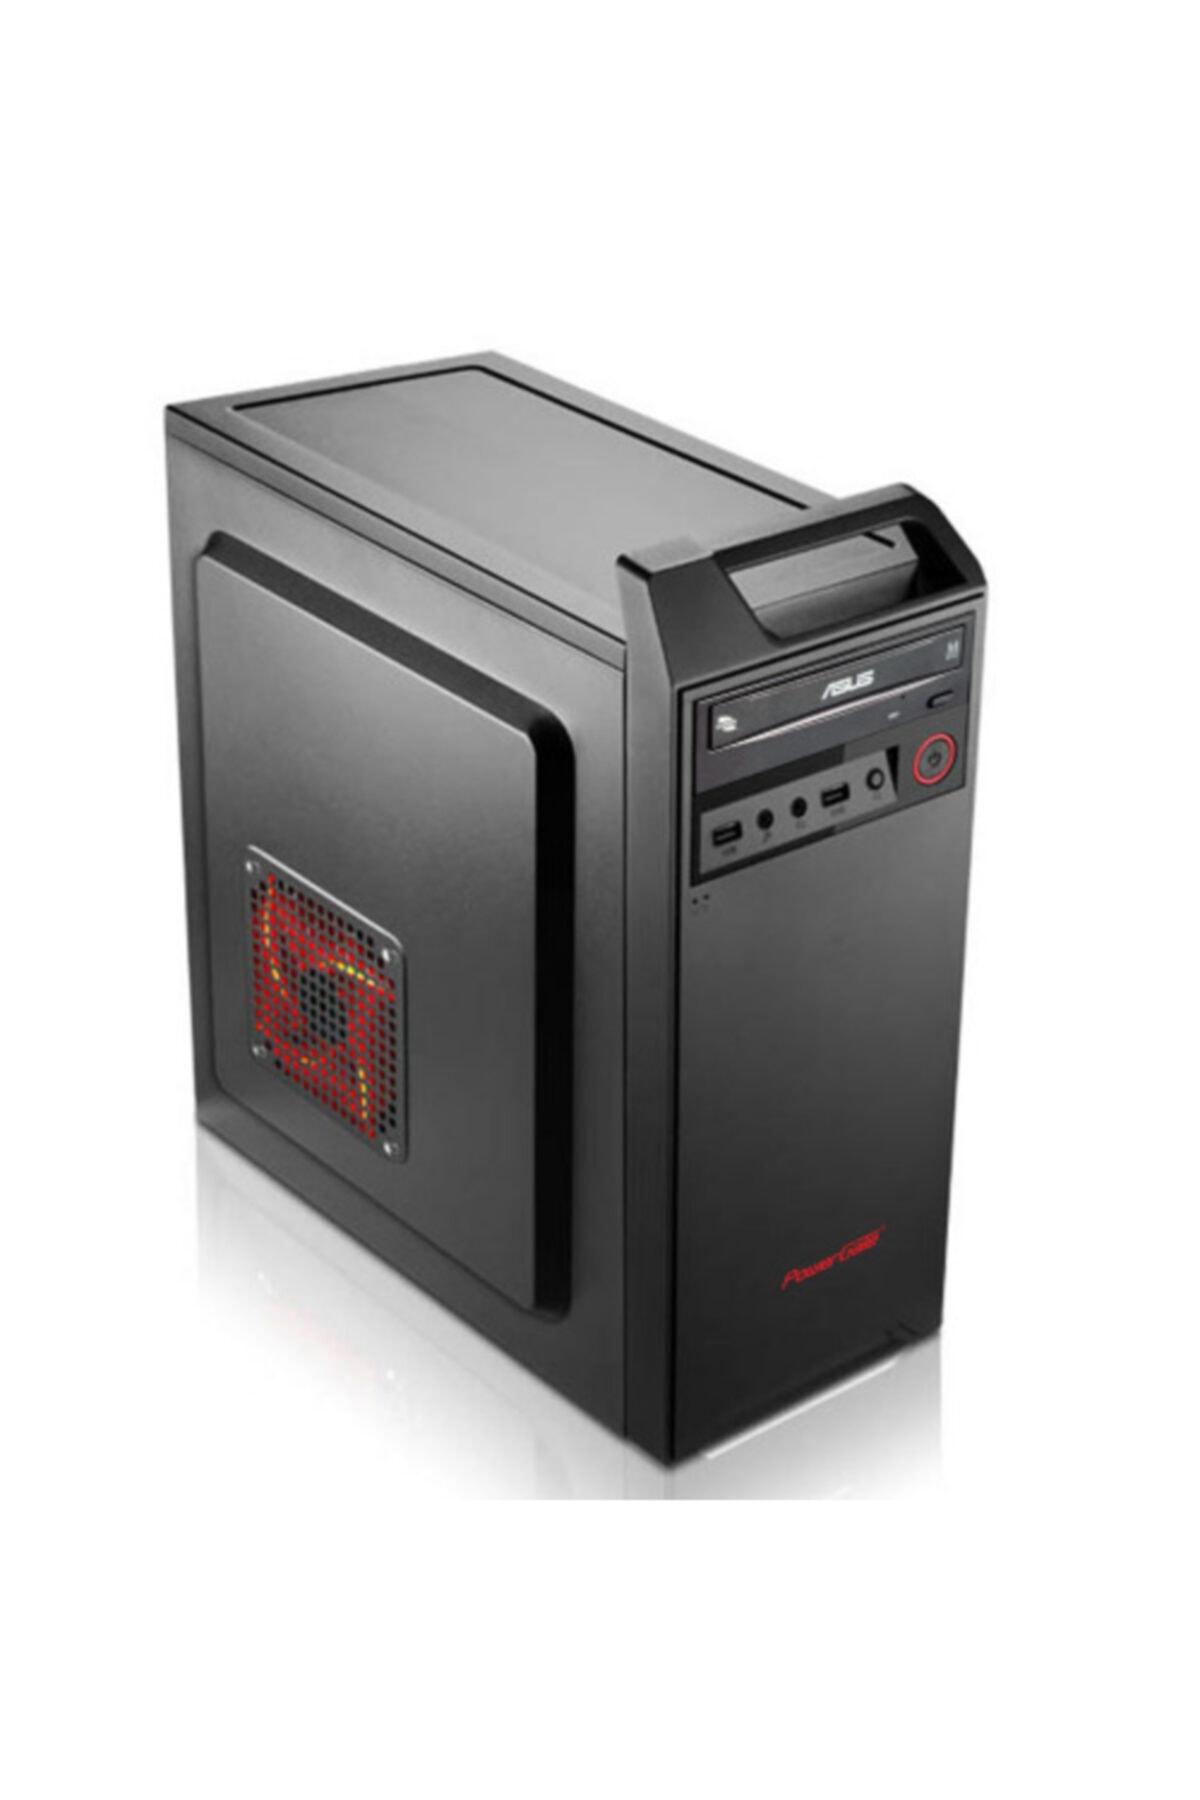 Powergate I3-7100 8gb Ram, 240gb Ssd, Paylaşımlı Ekran Kartı, Free Dos Masaüstü Pc 1